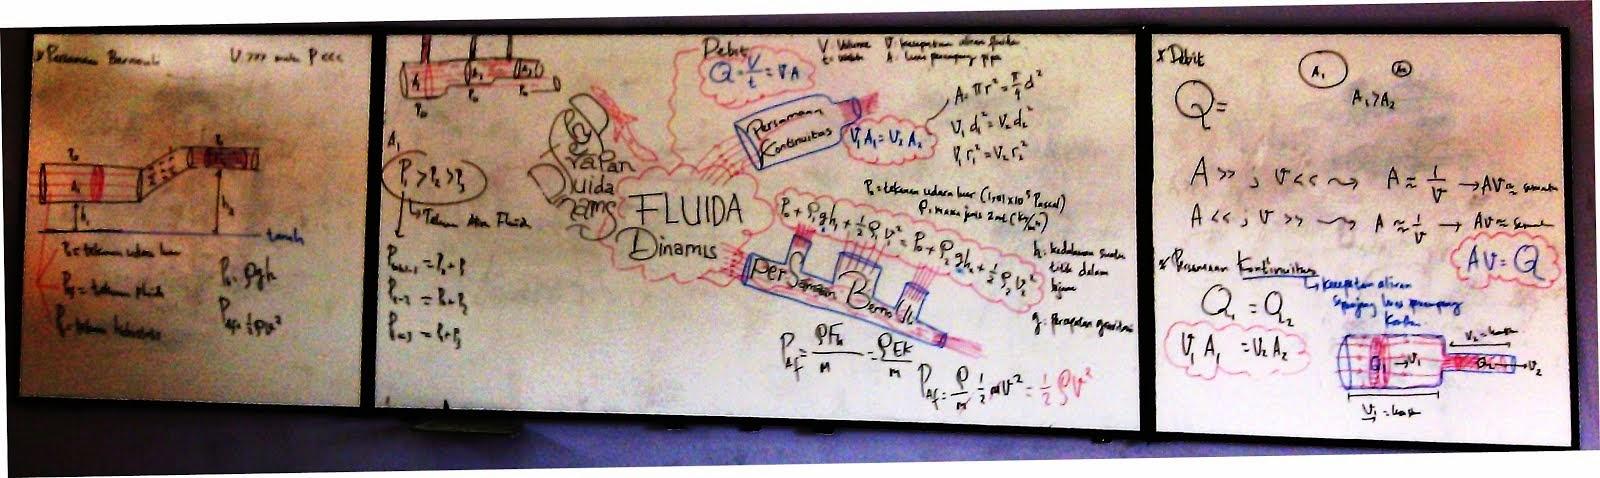 Peta Konsep Fluida Dinamis